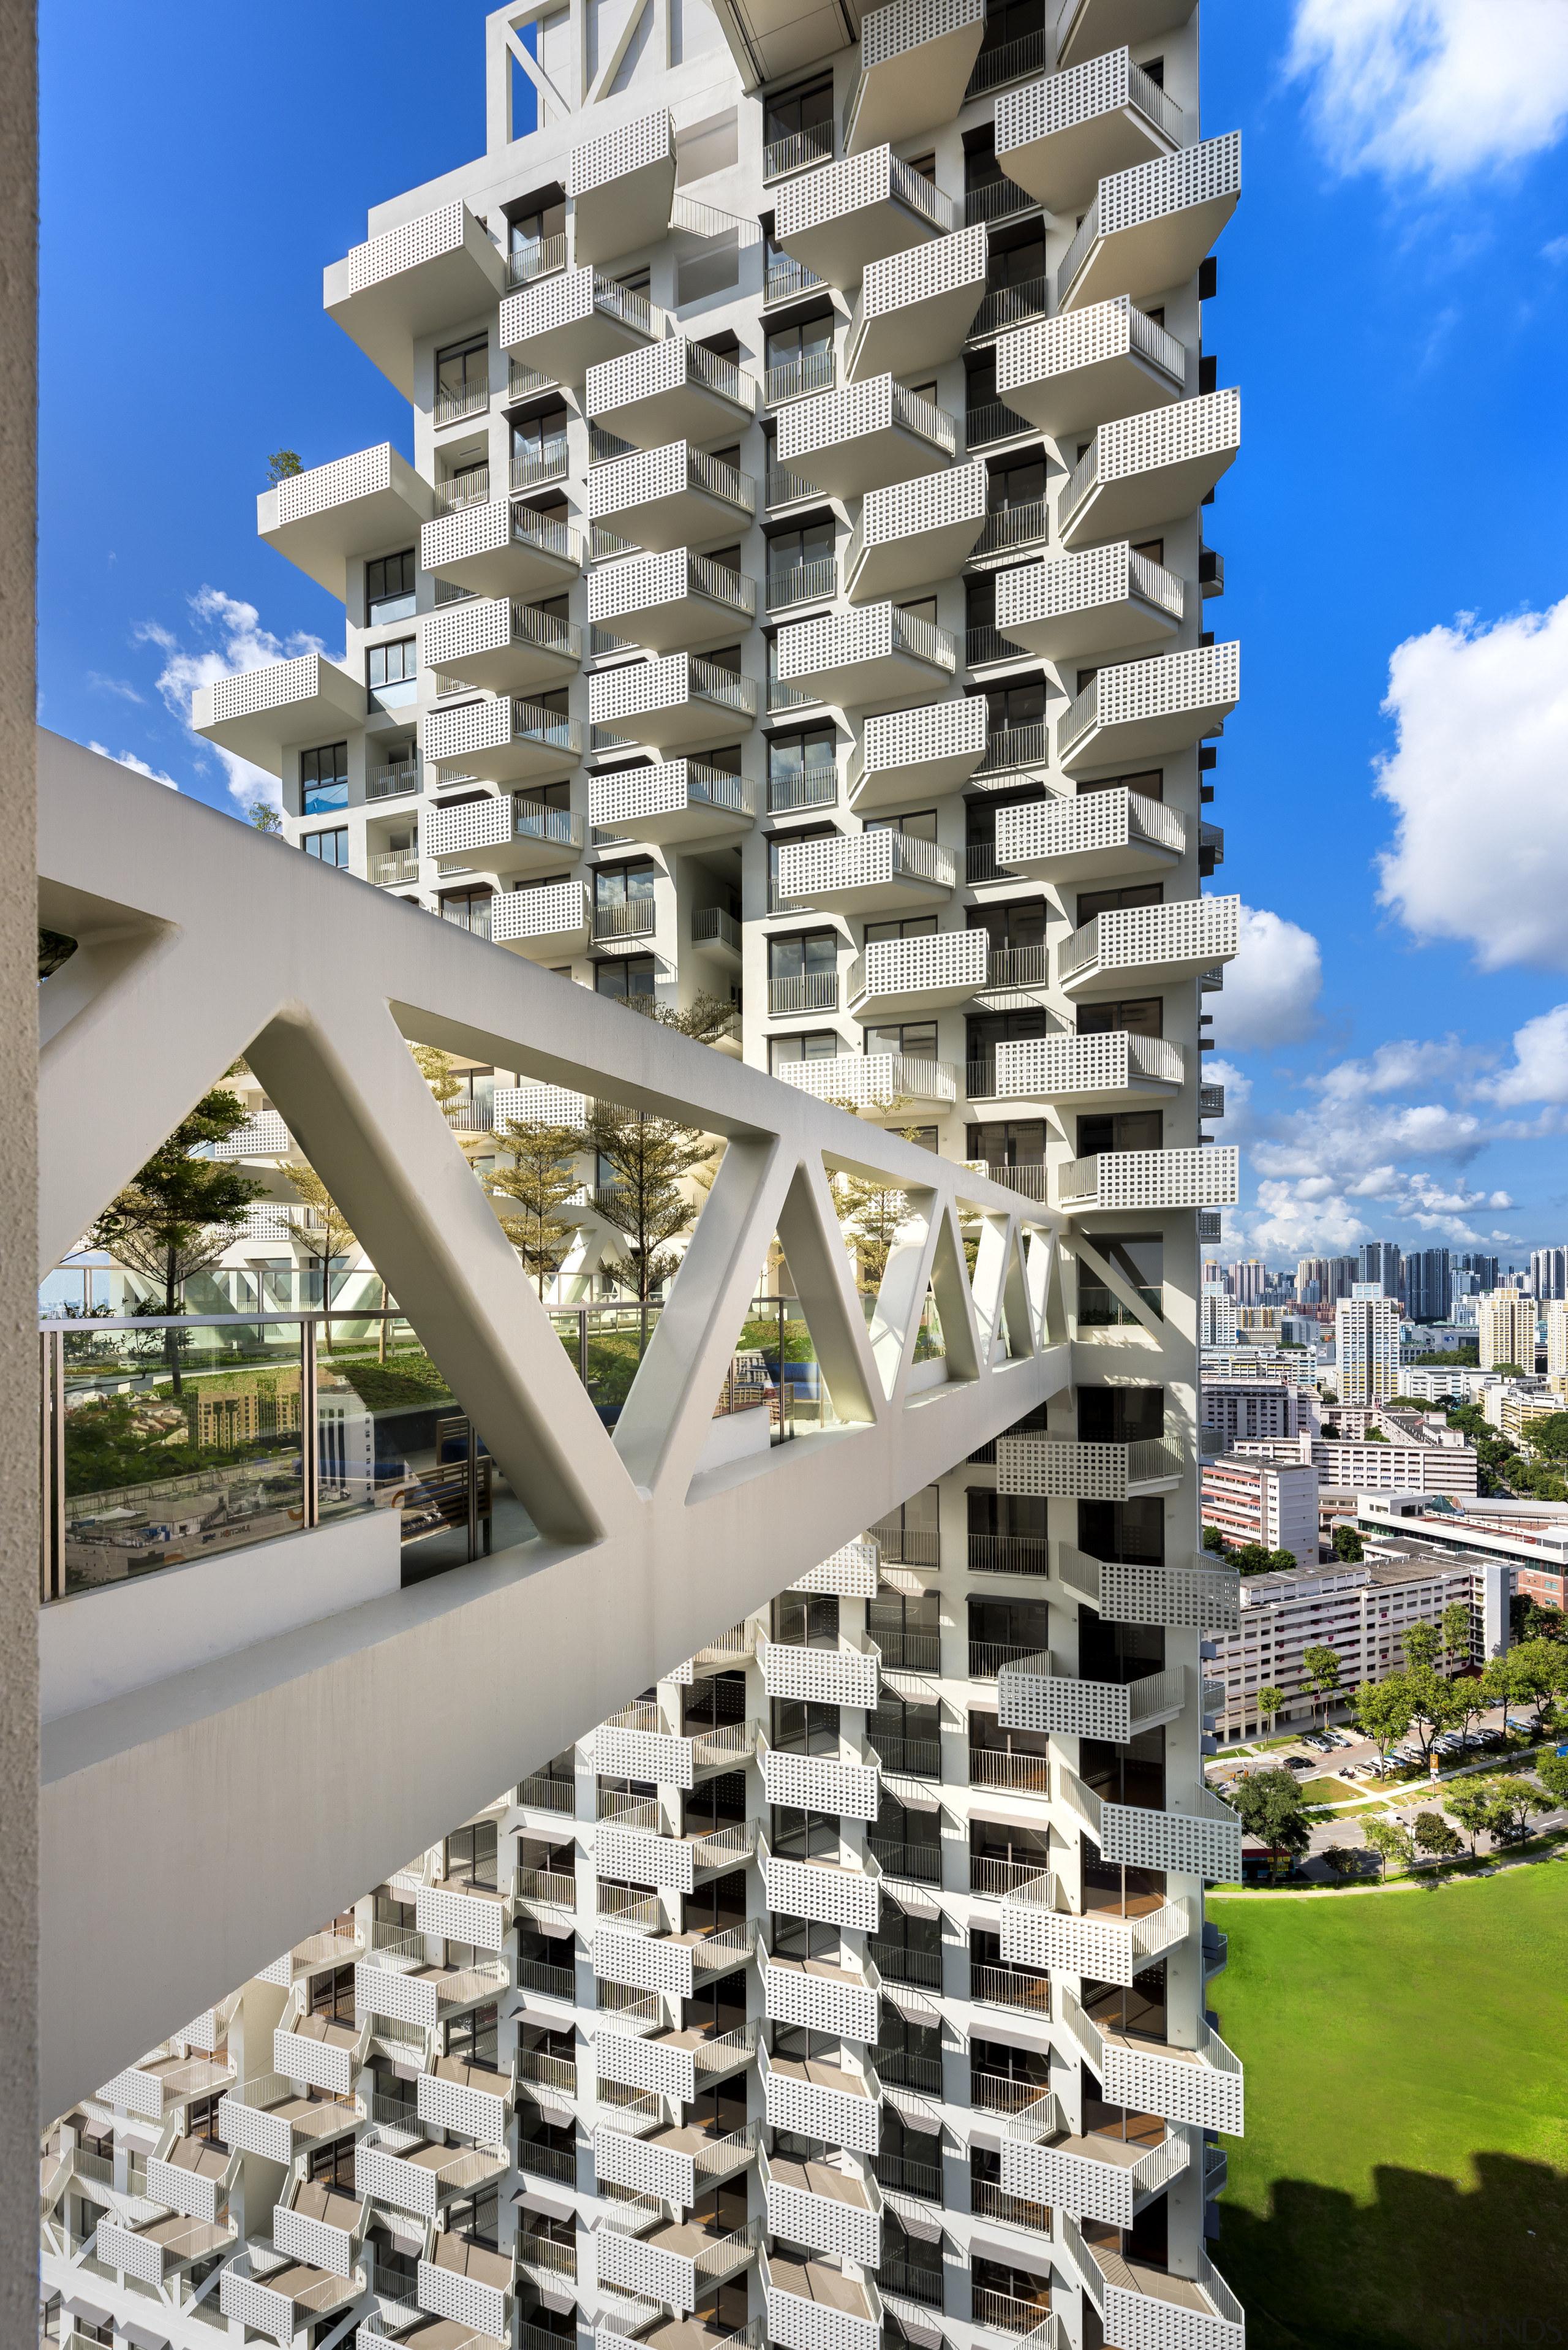 Safdie Architects design of Sky Habitat maximises views apartment, architecture, building, condominium, facade, metropolis, mixed use, property, real estate, residential area, sky, skyscraper, tower block, gray